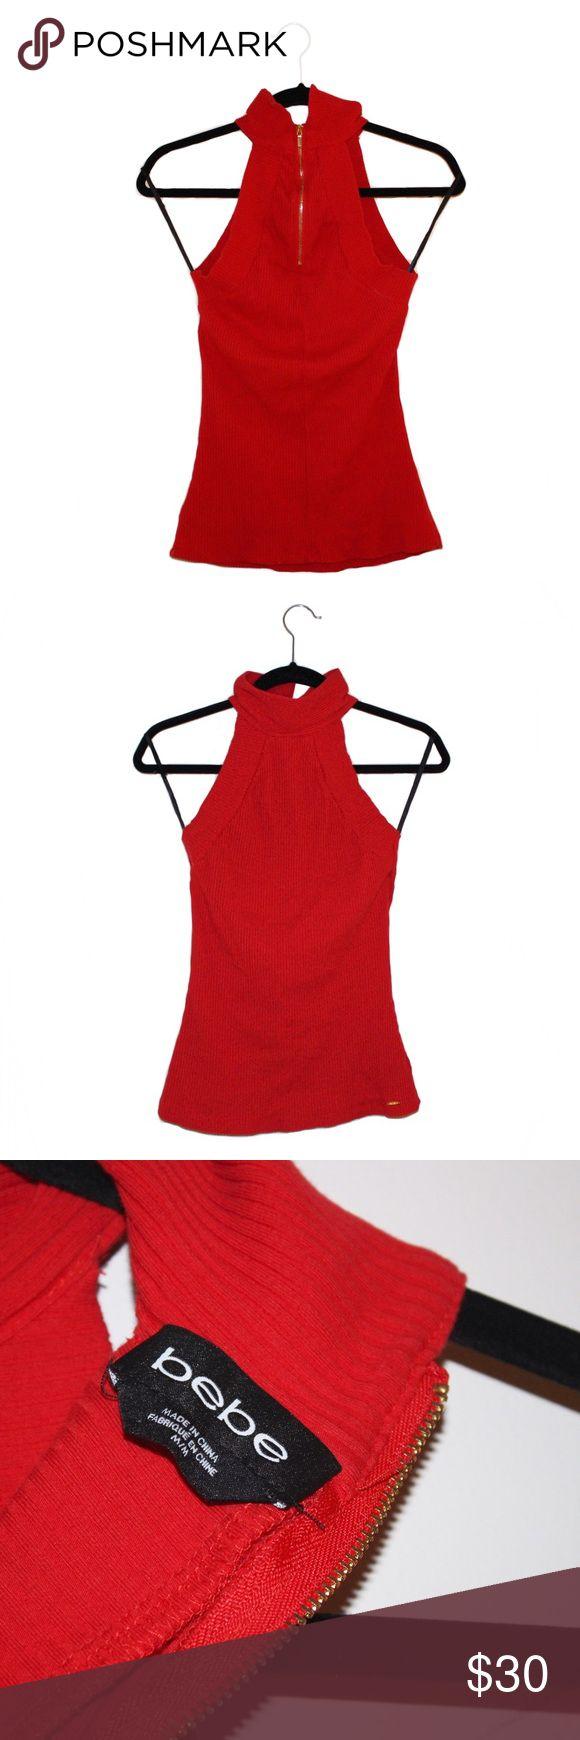 💥SALE💥Ribbed BEBE halter top High neck. Ribbed and has no visible signs of wear. bebe Tops Tank Tops